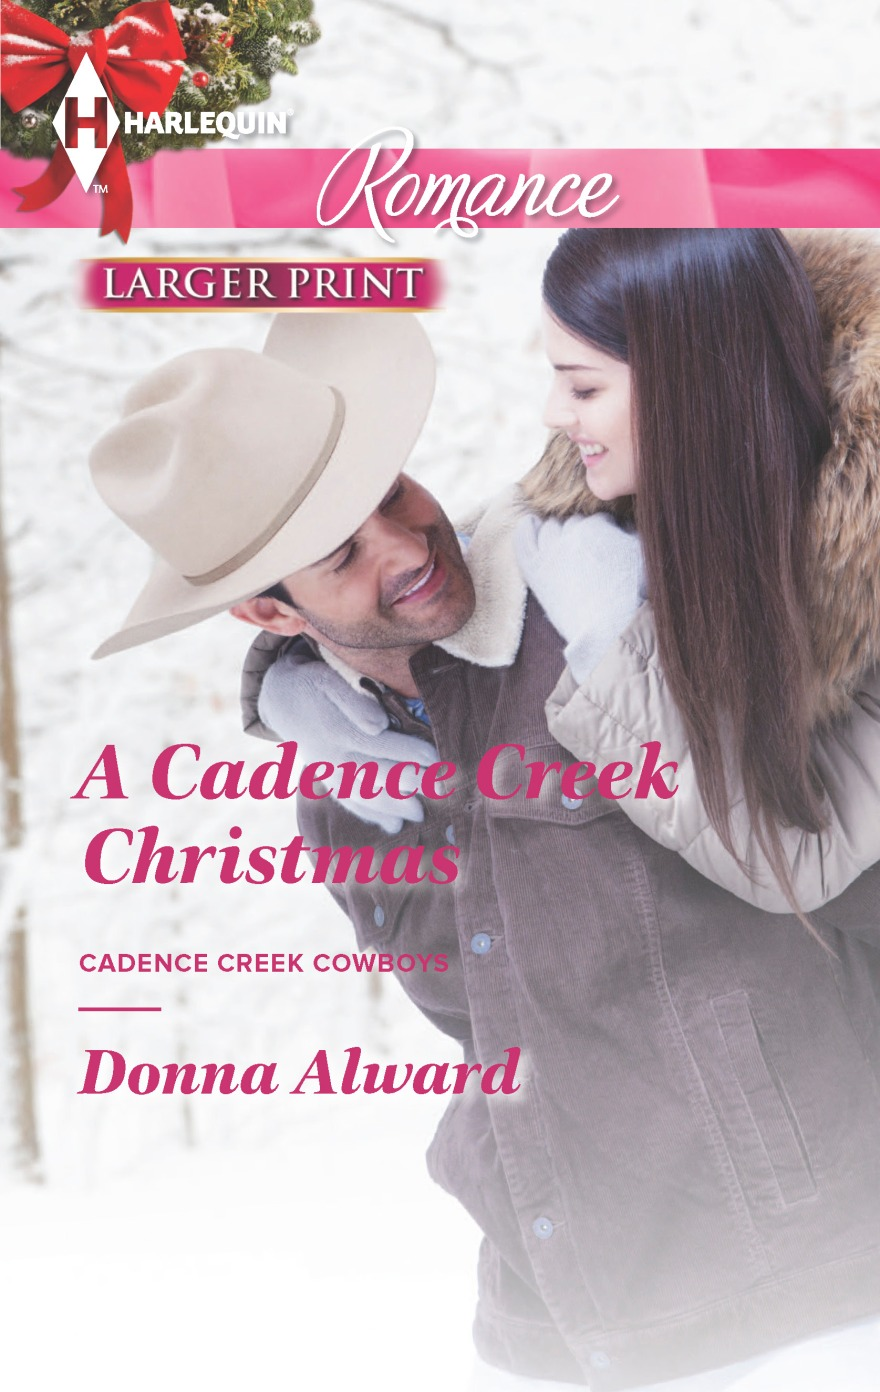 A Cadence Creek Christmas